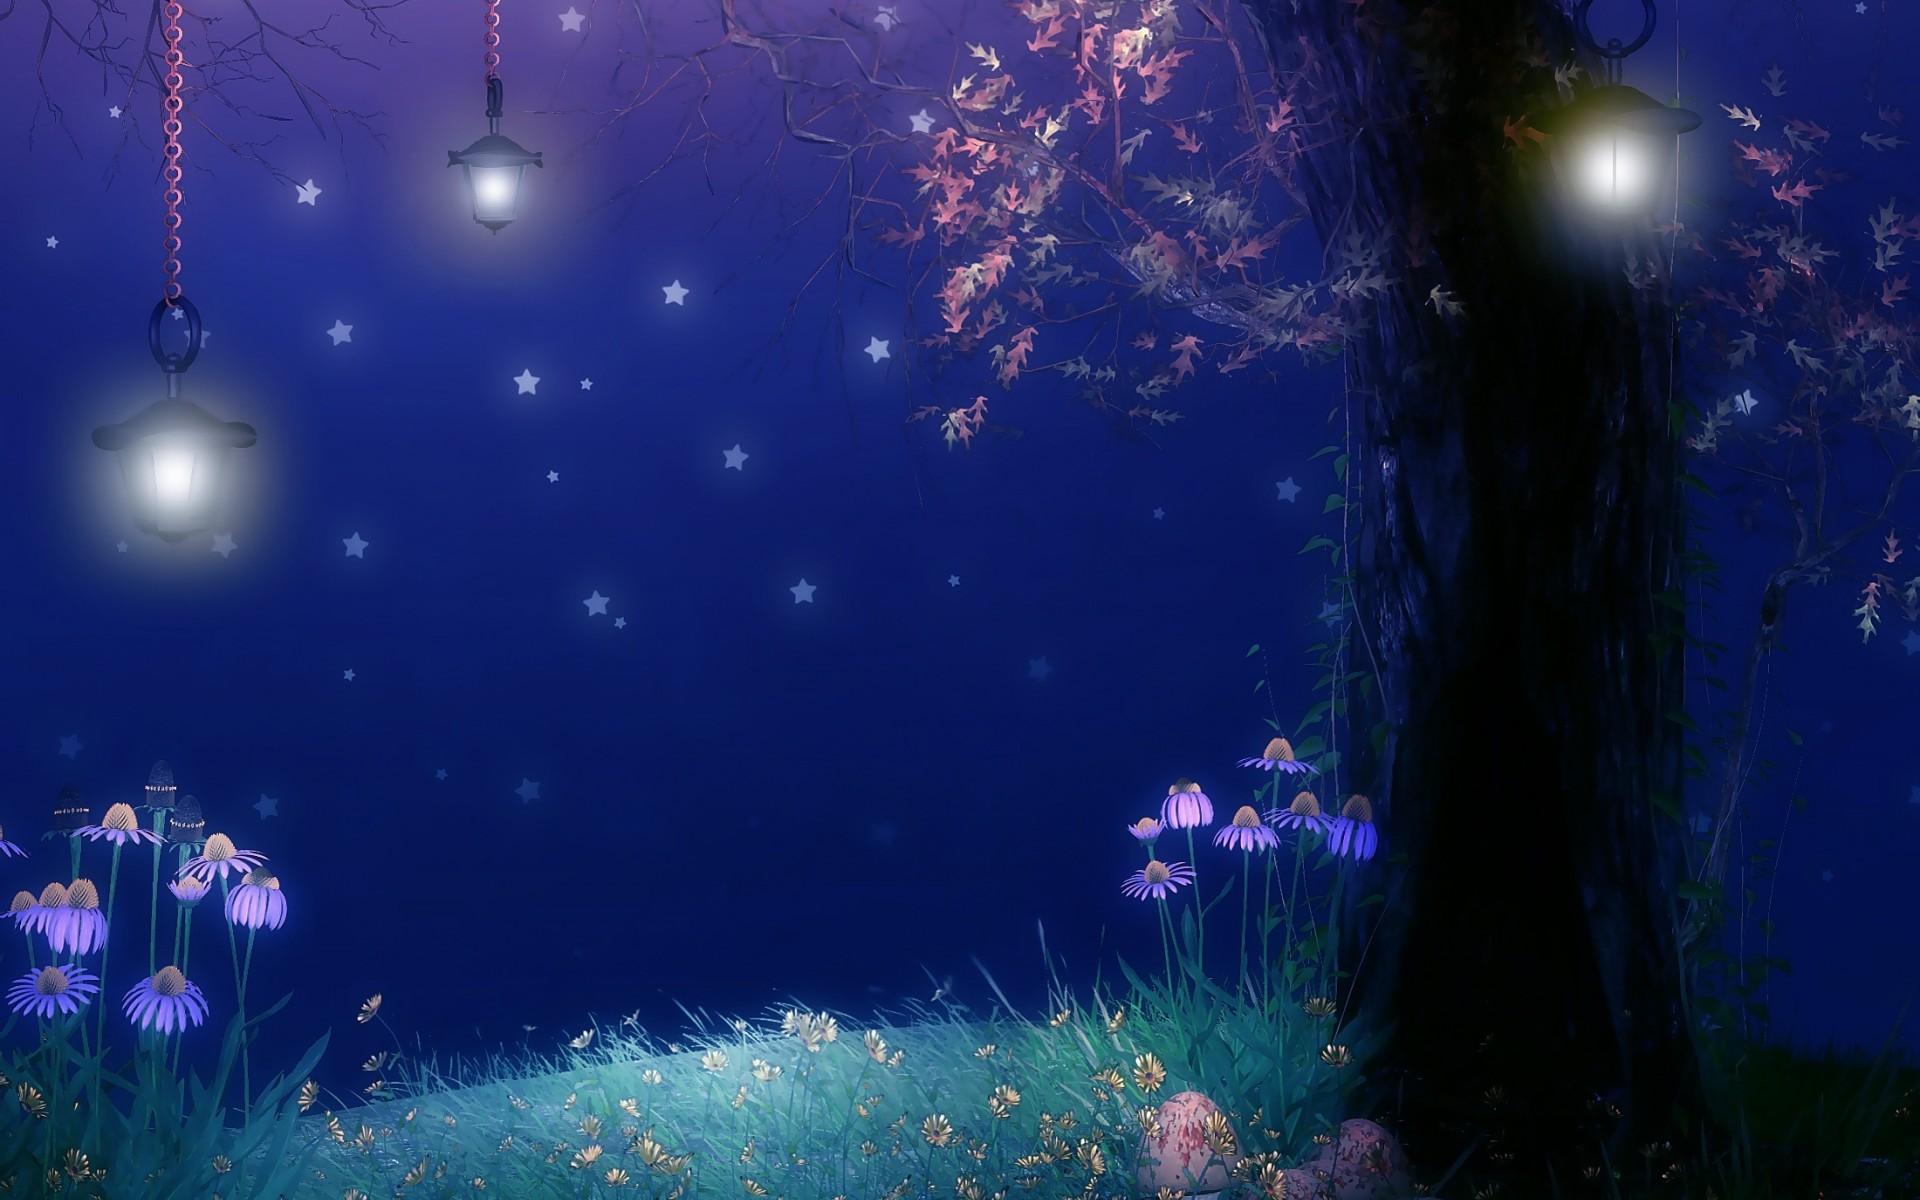 Fantasy Landscapes Art Soft Night Flowers Trees Dream Sky